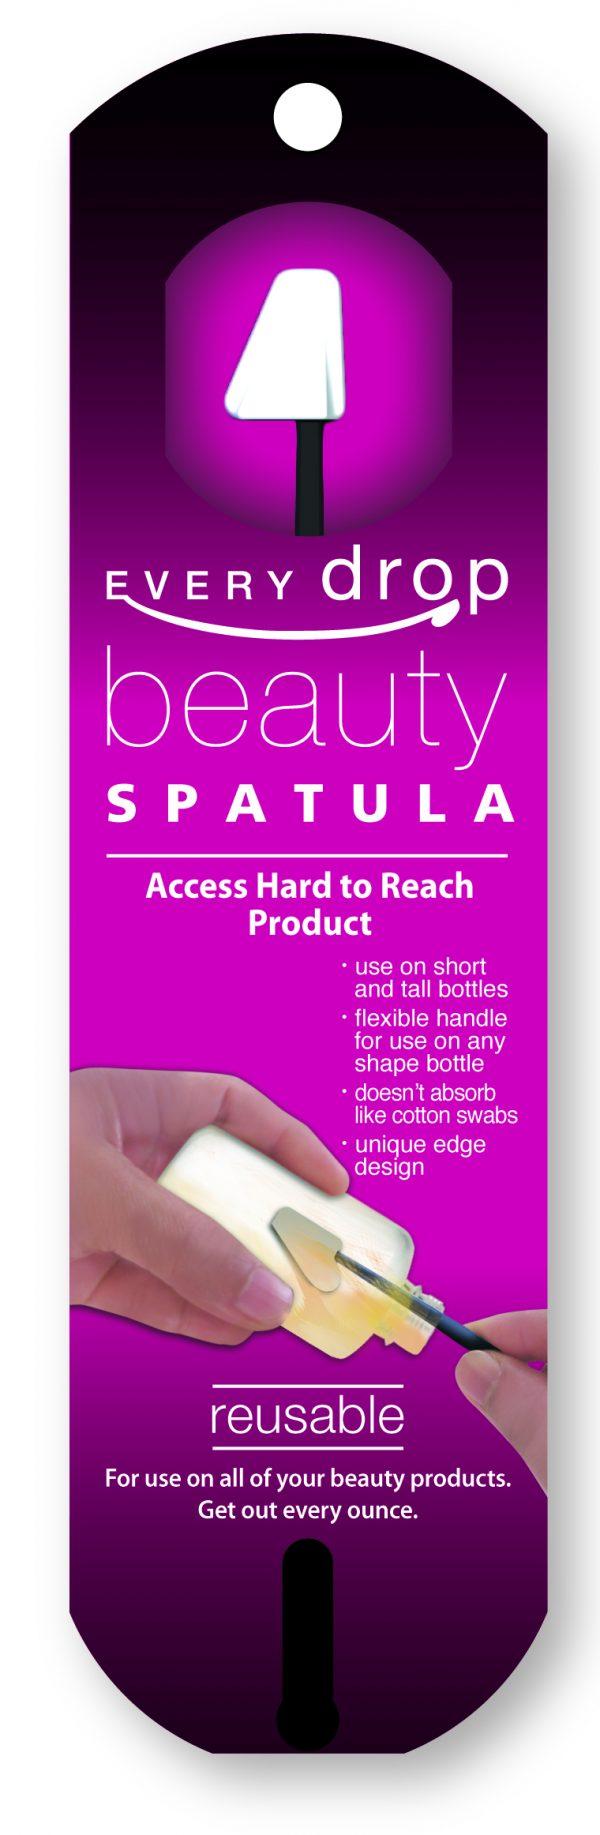 Every Drop Beauty Spatula